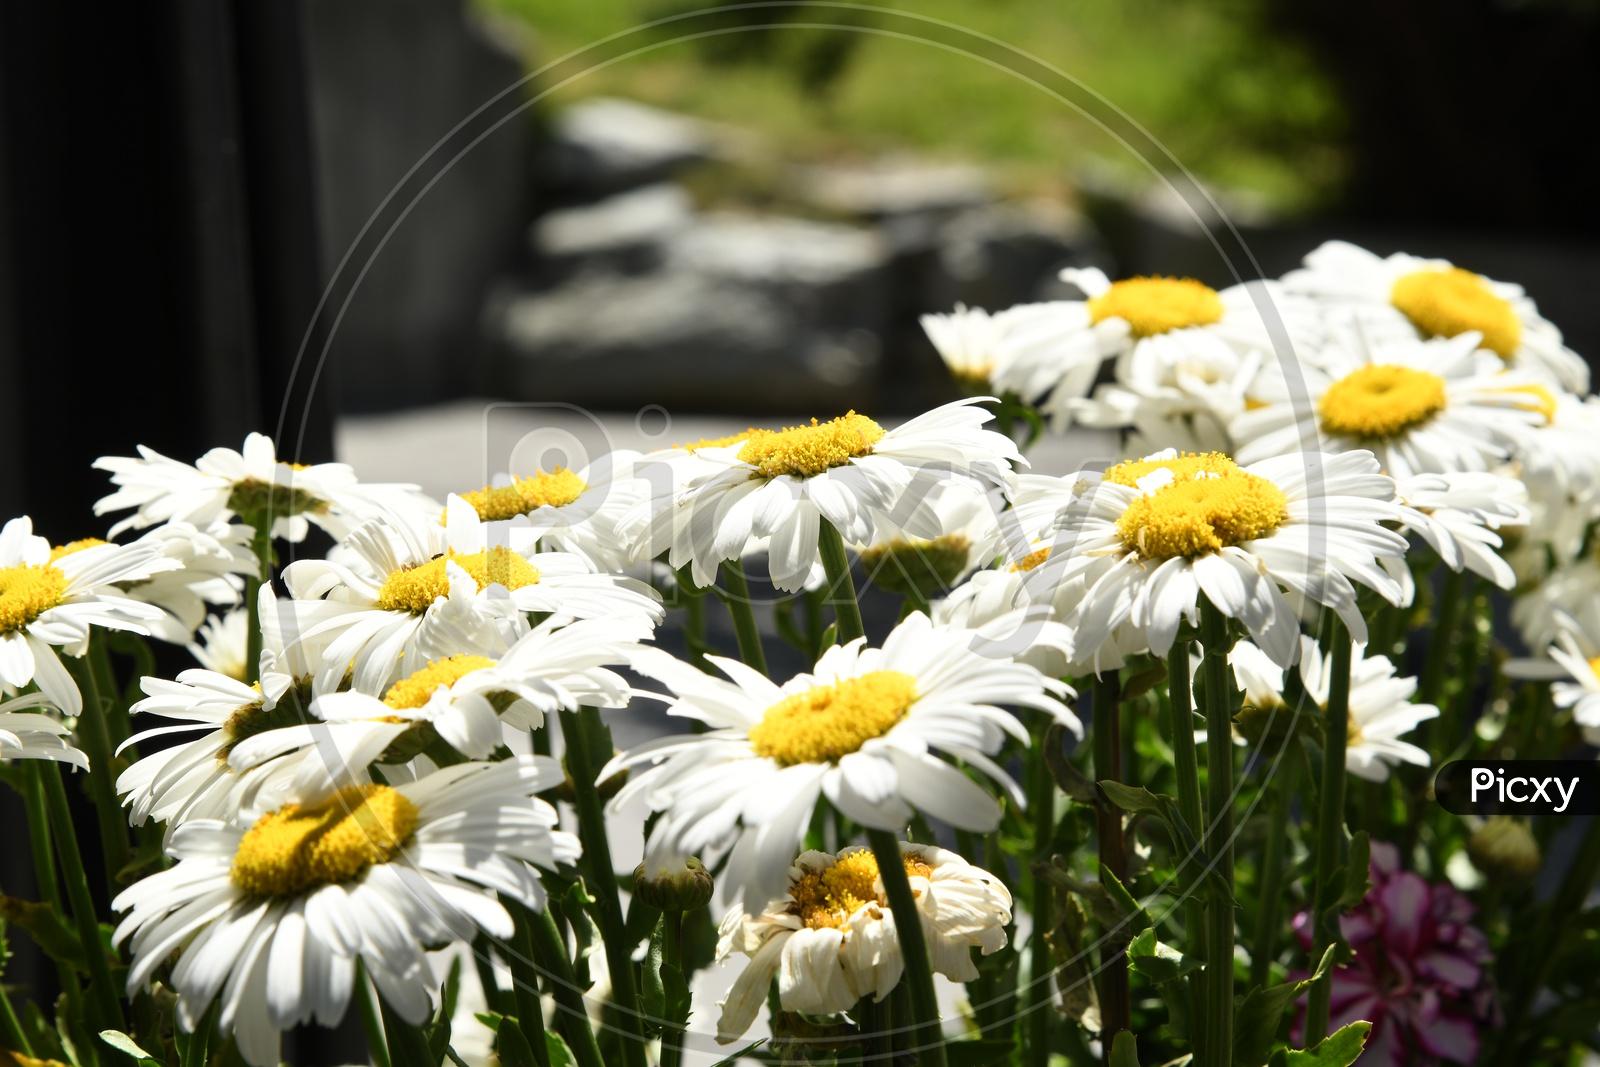 White Chrysanthemum Flowers Blooming on Plant